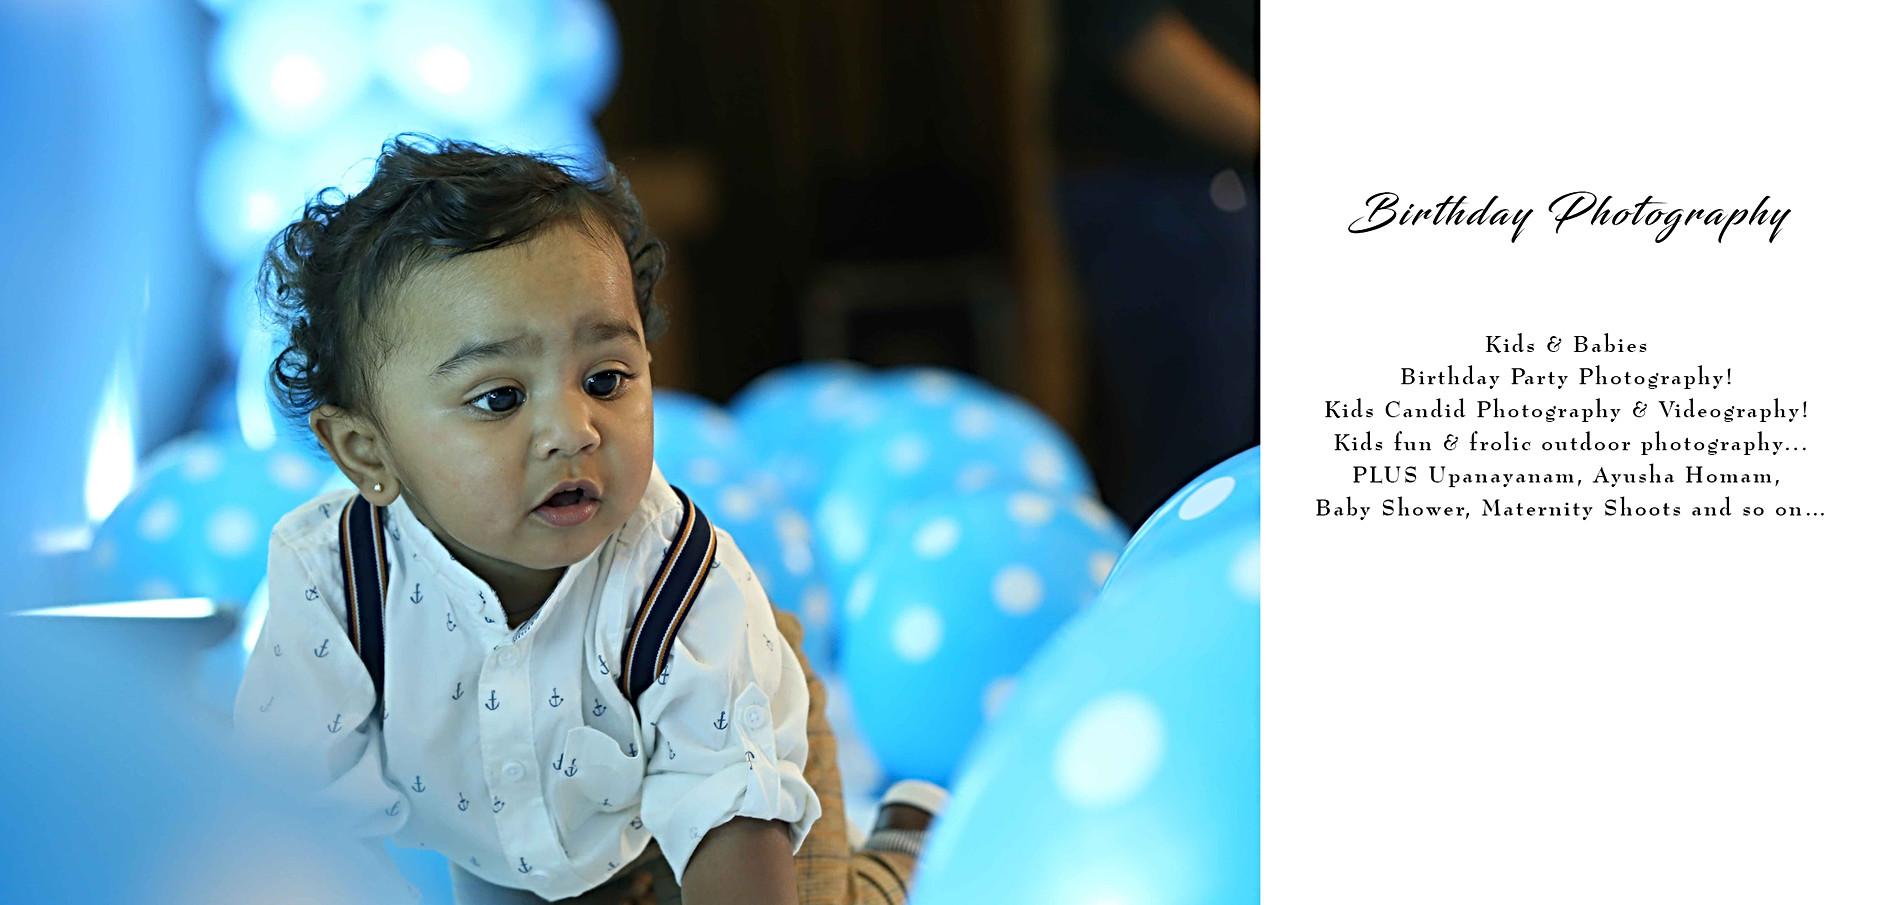 Birthday Photography.jpg